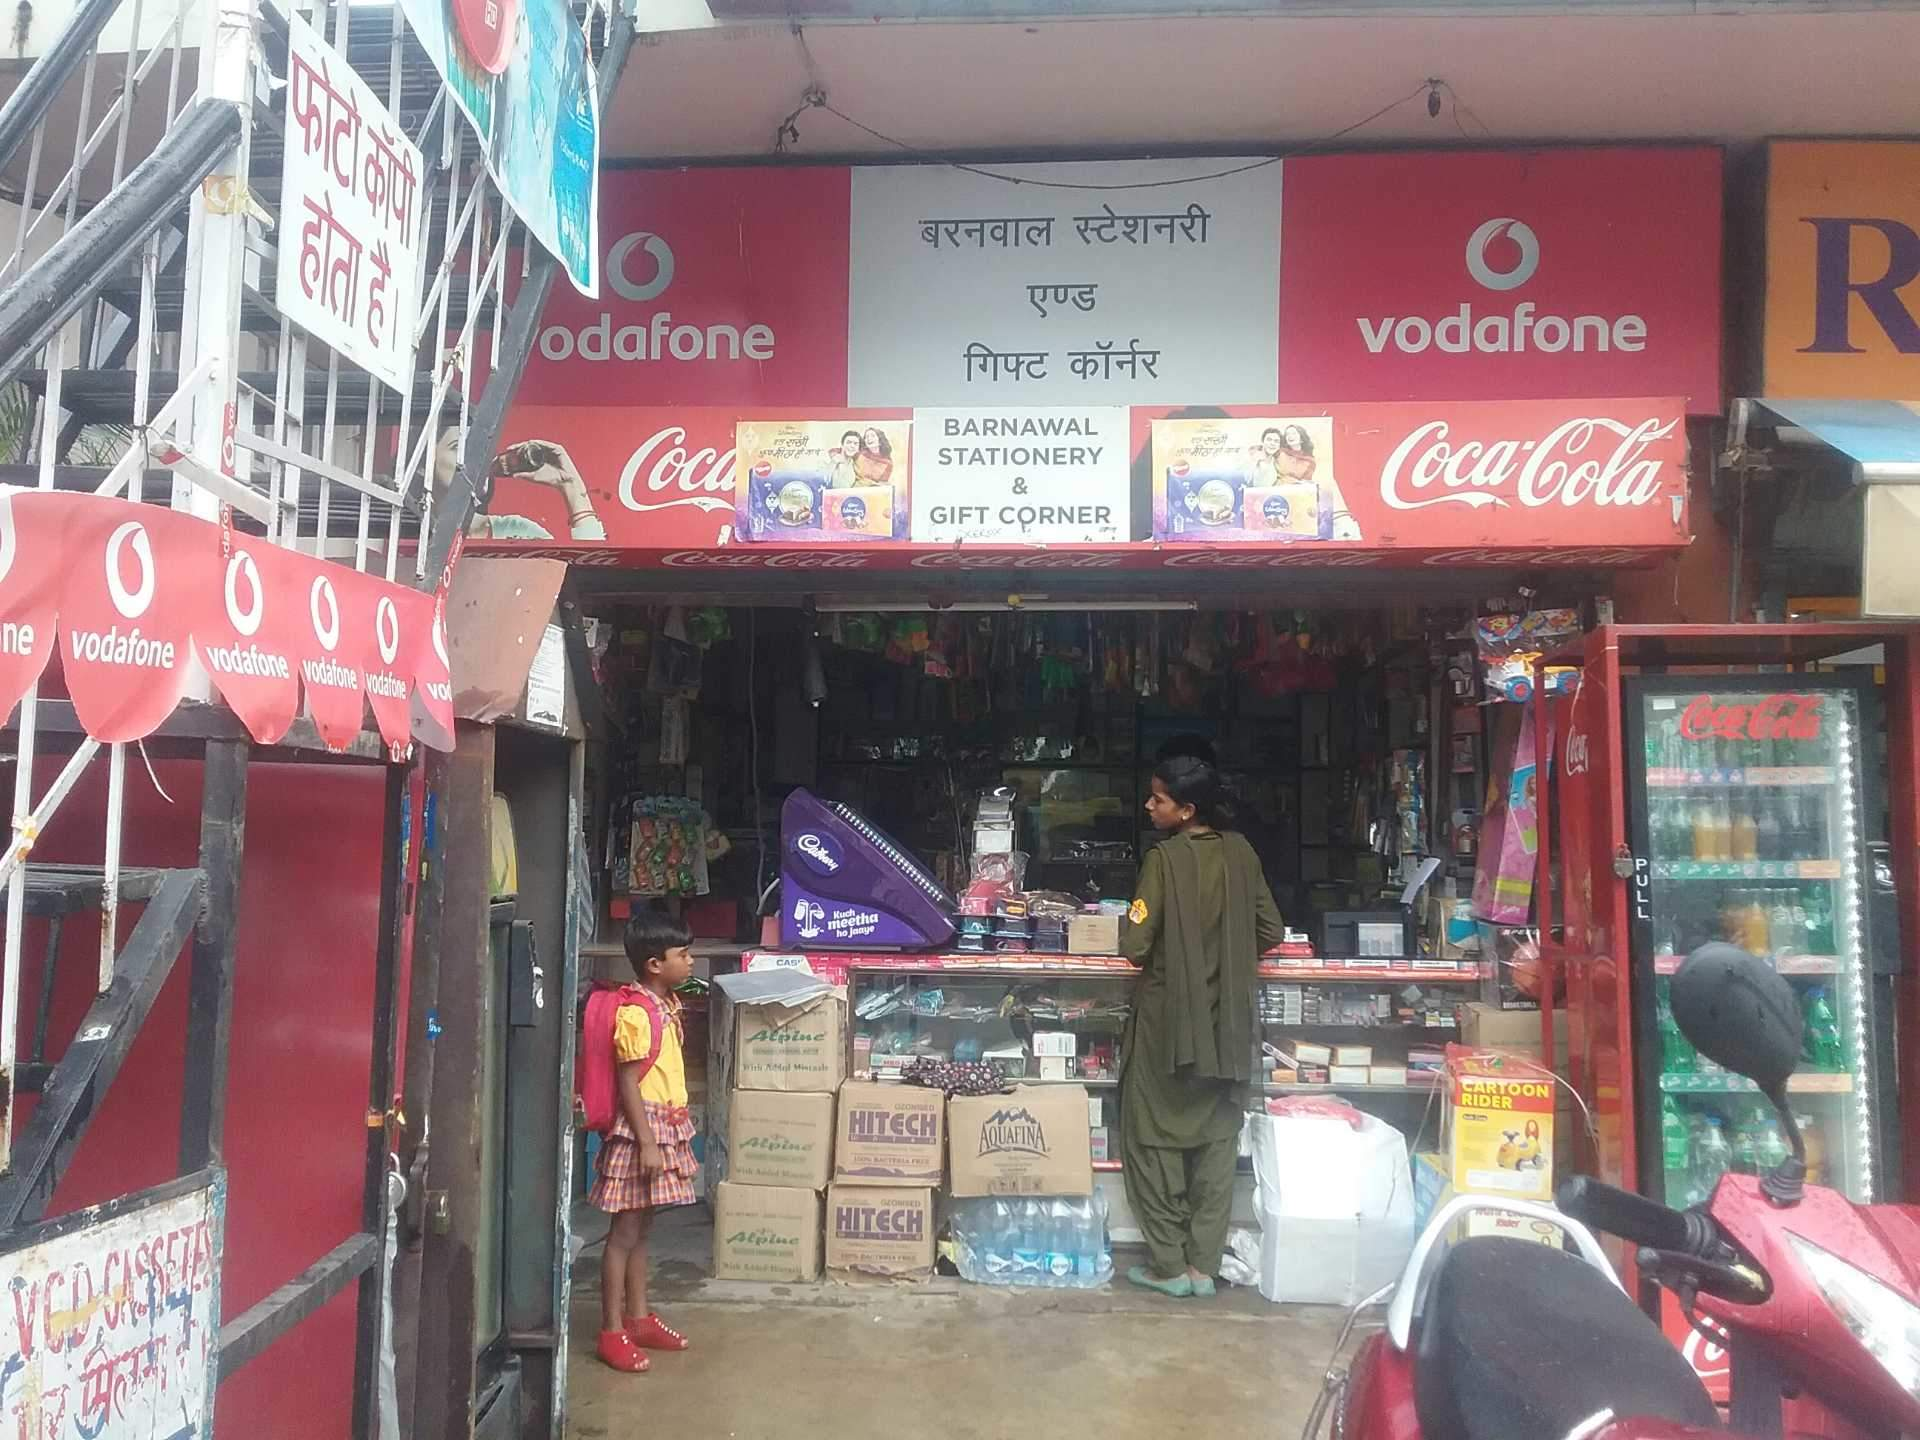 Barnawal Stationery & Gift Corner